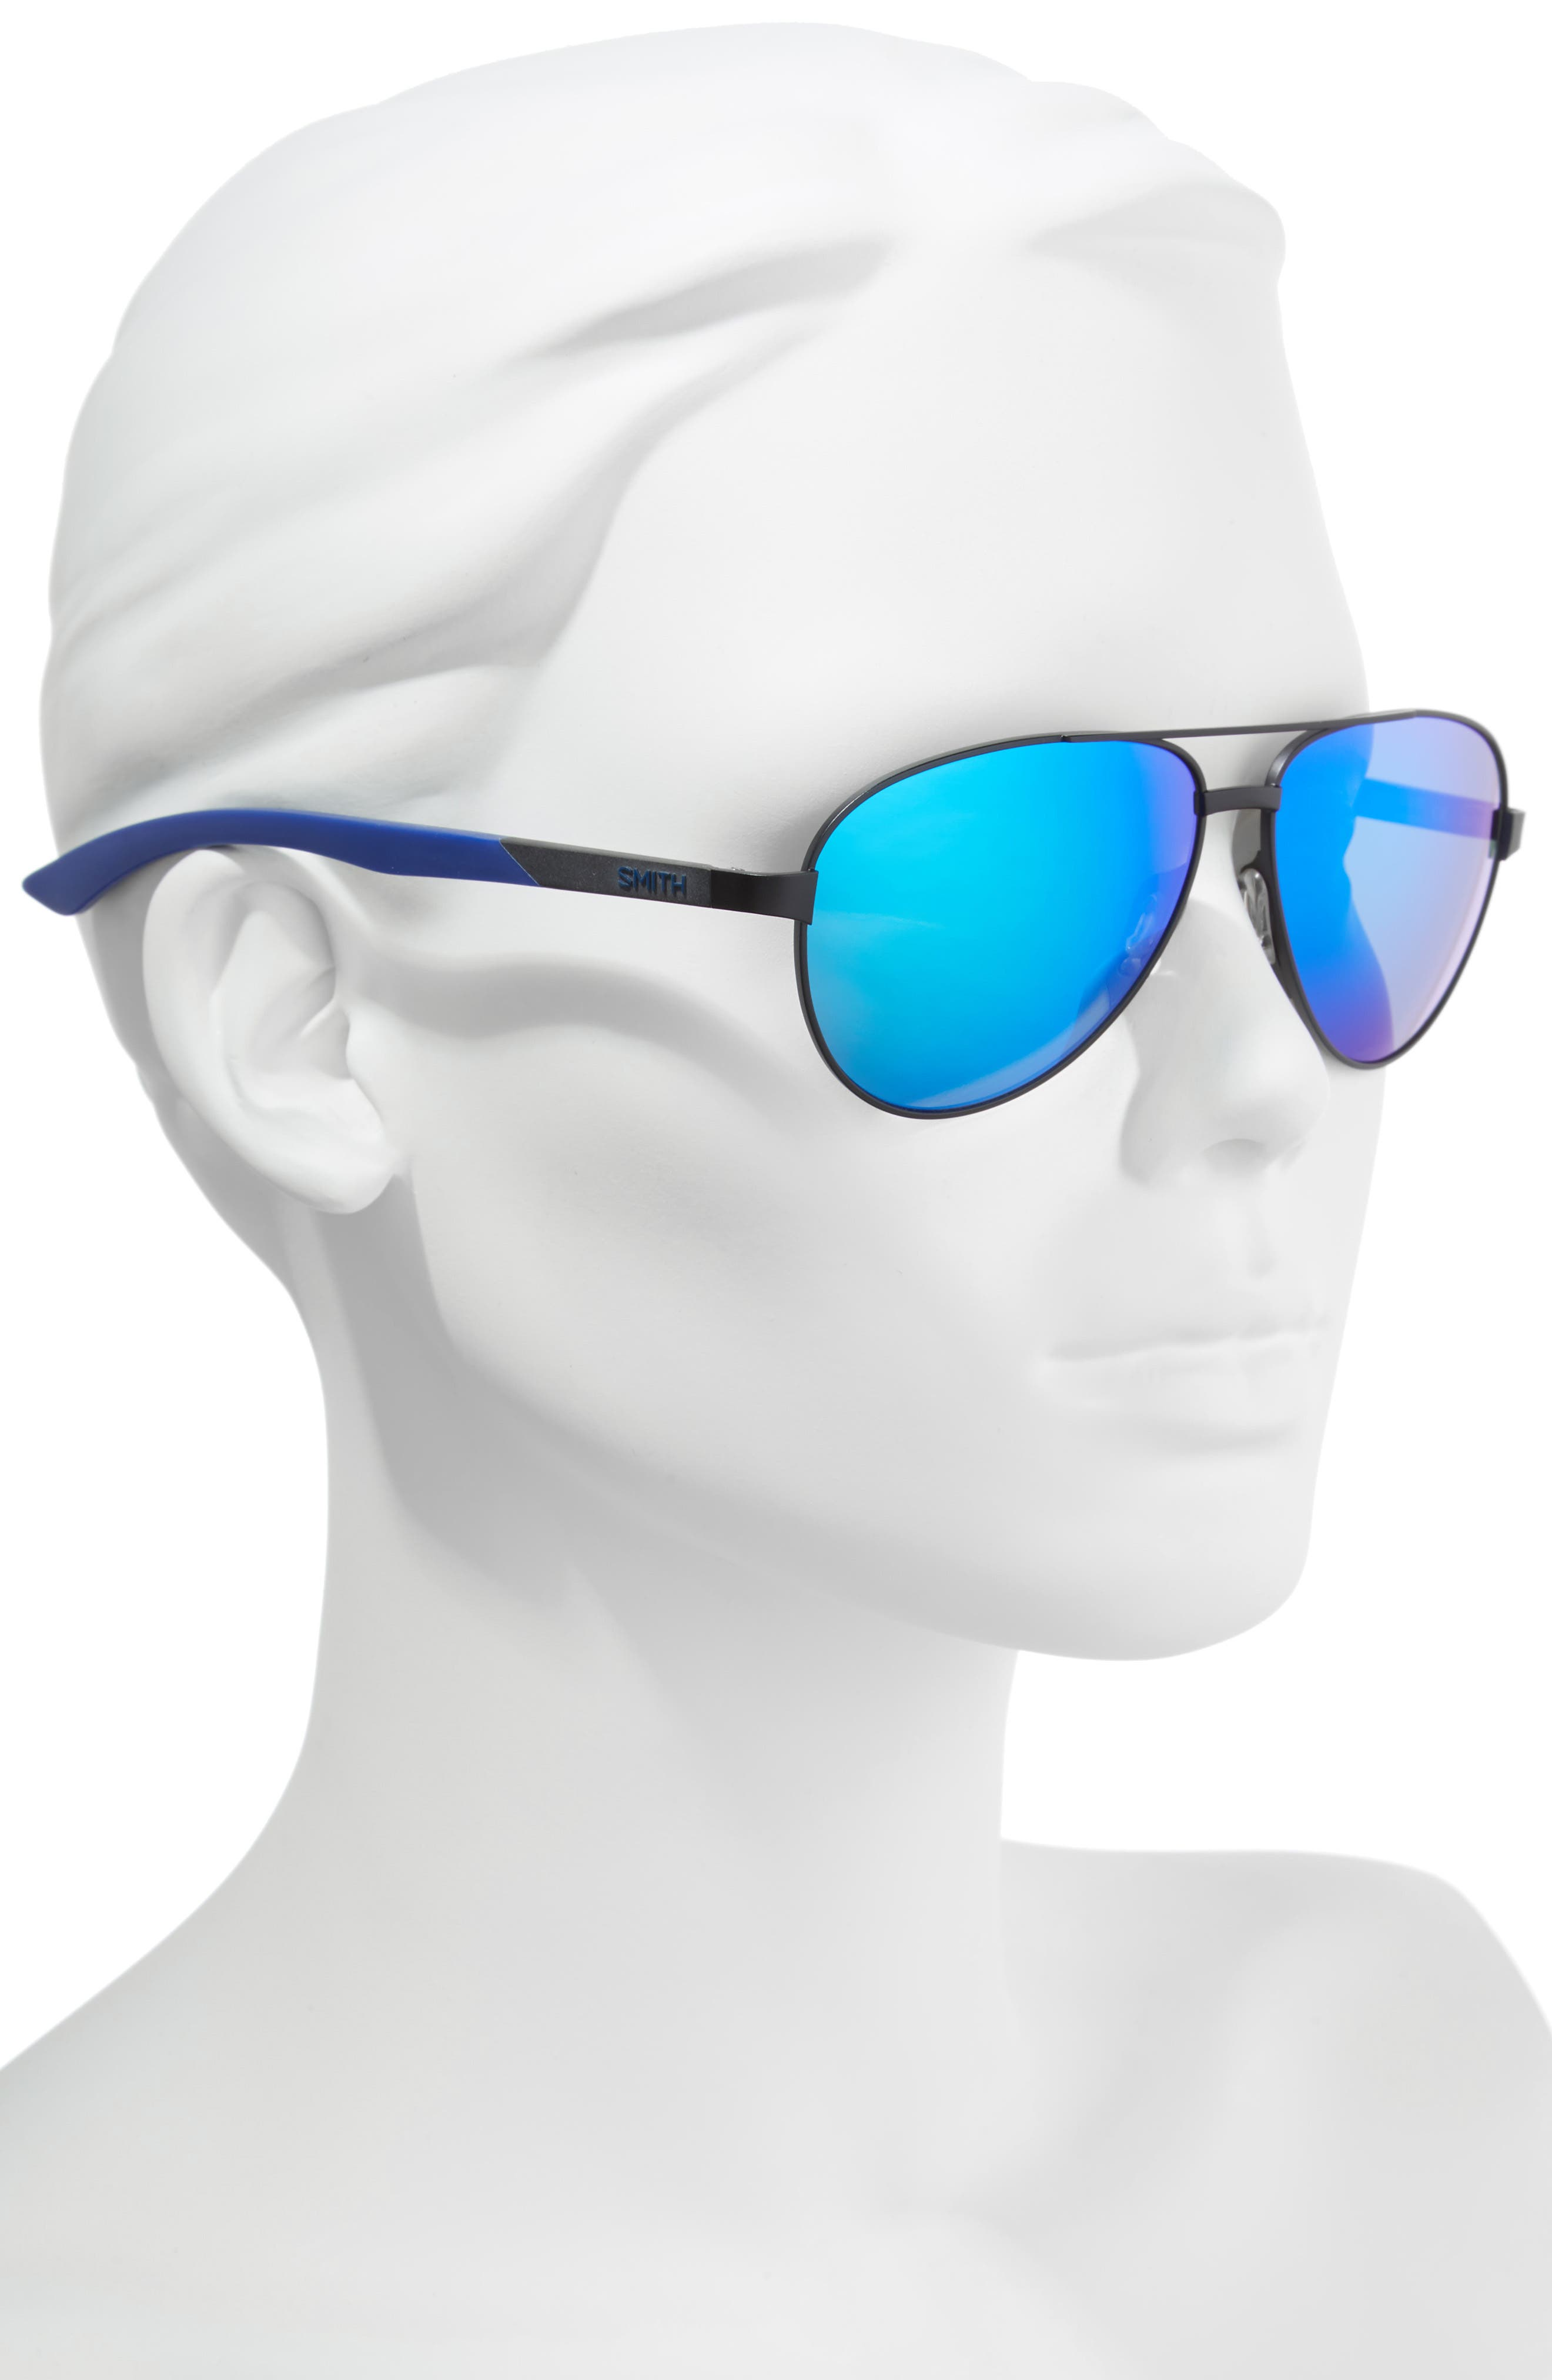 Salute 59mm Aviator Sunglasses,                             Alternate thumbnail 2, color,                             Matte Black